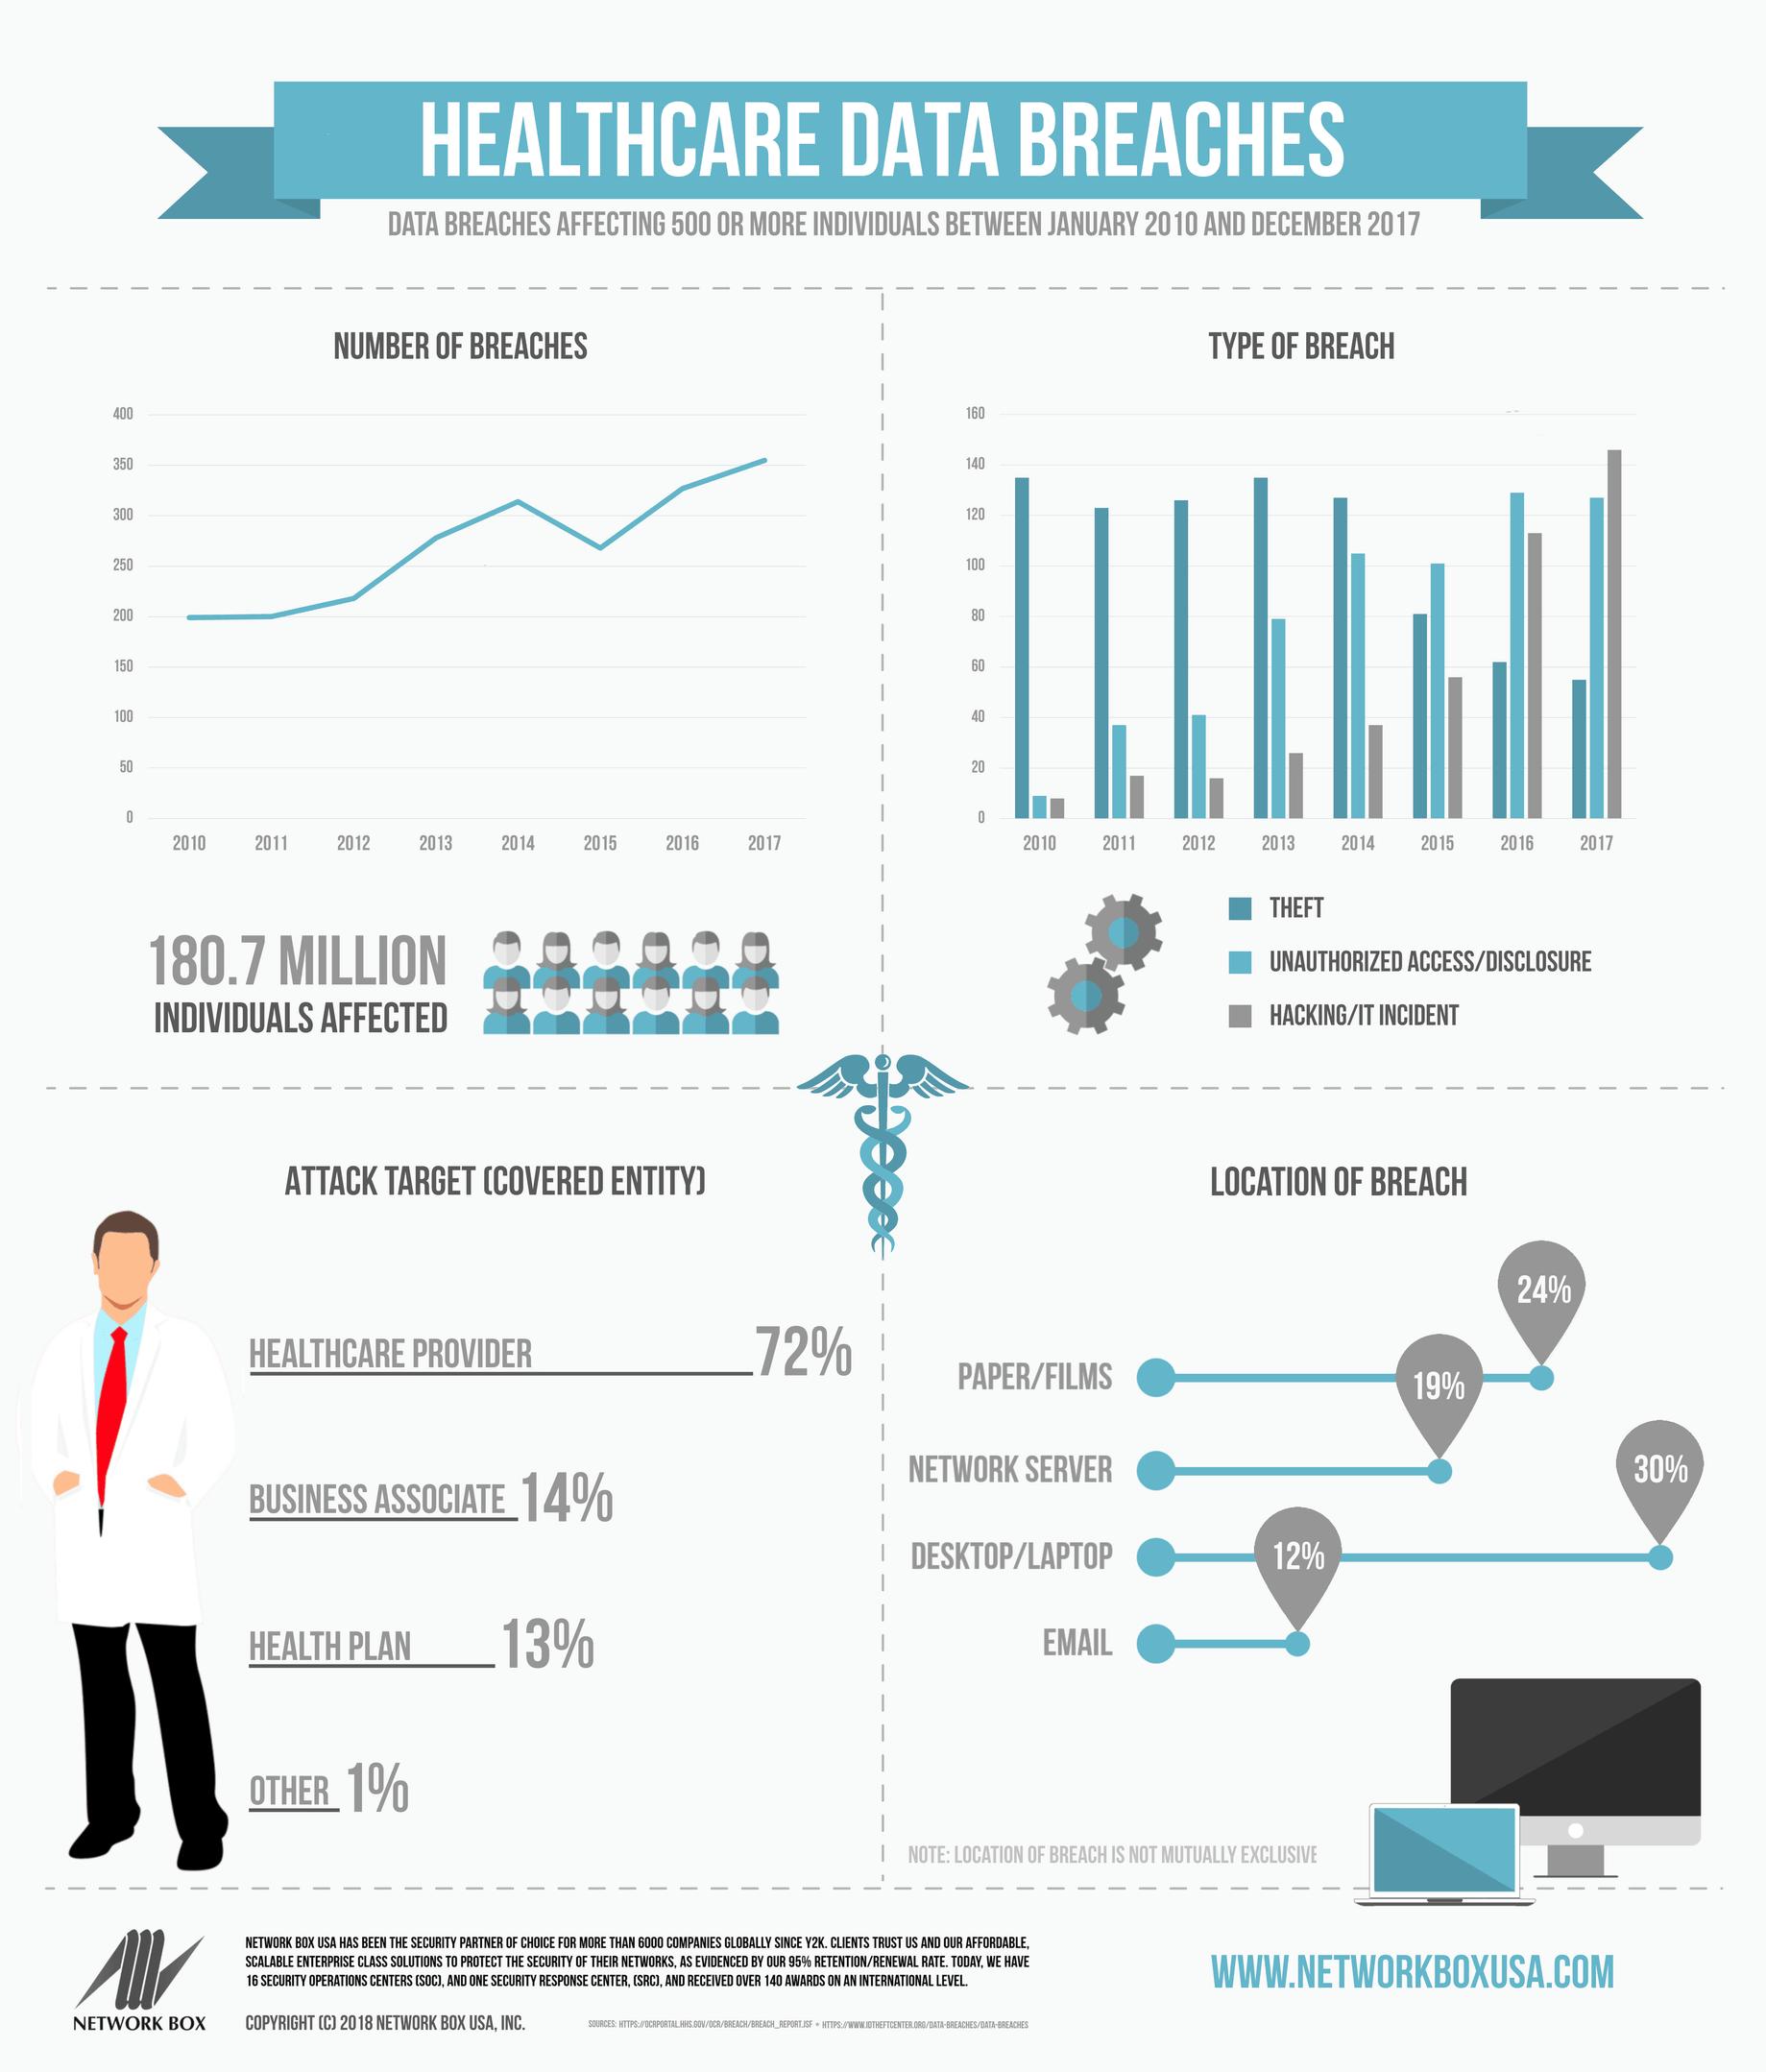 healthcare data breaches infographic